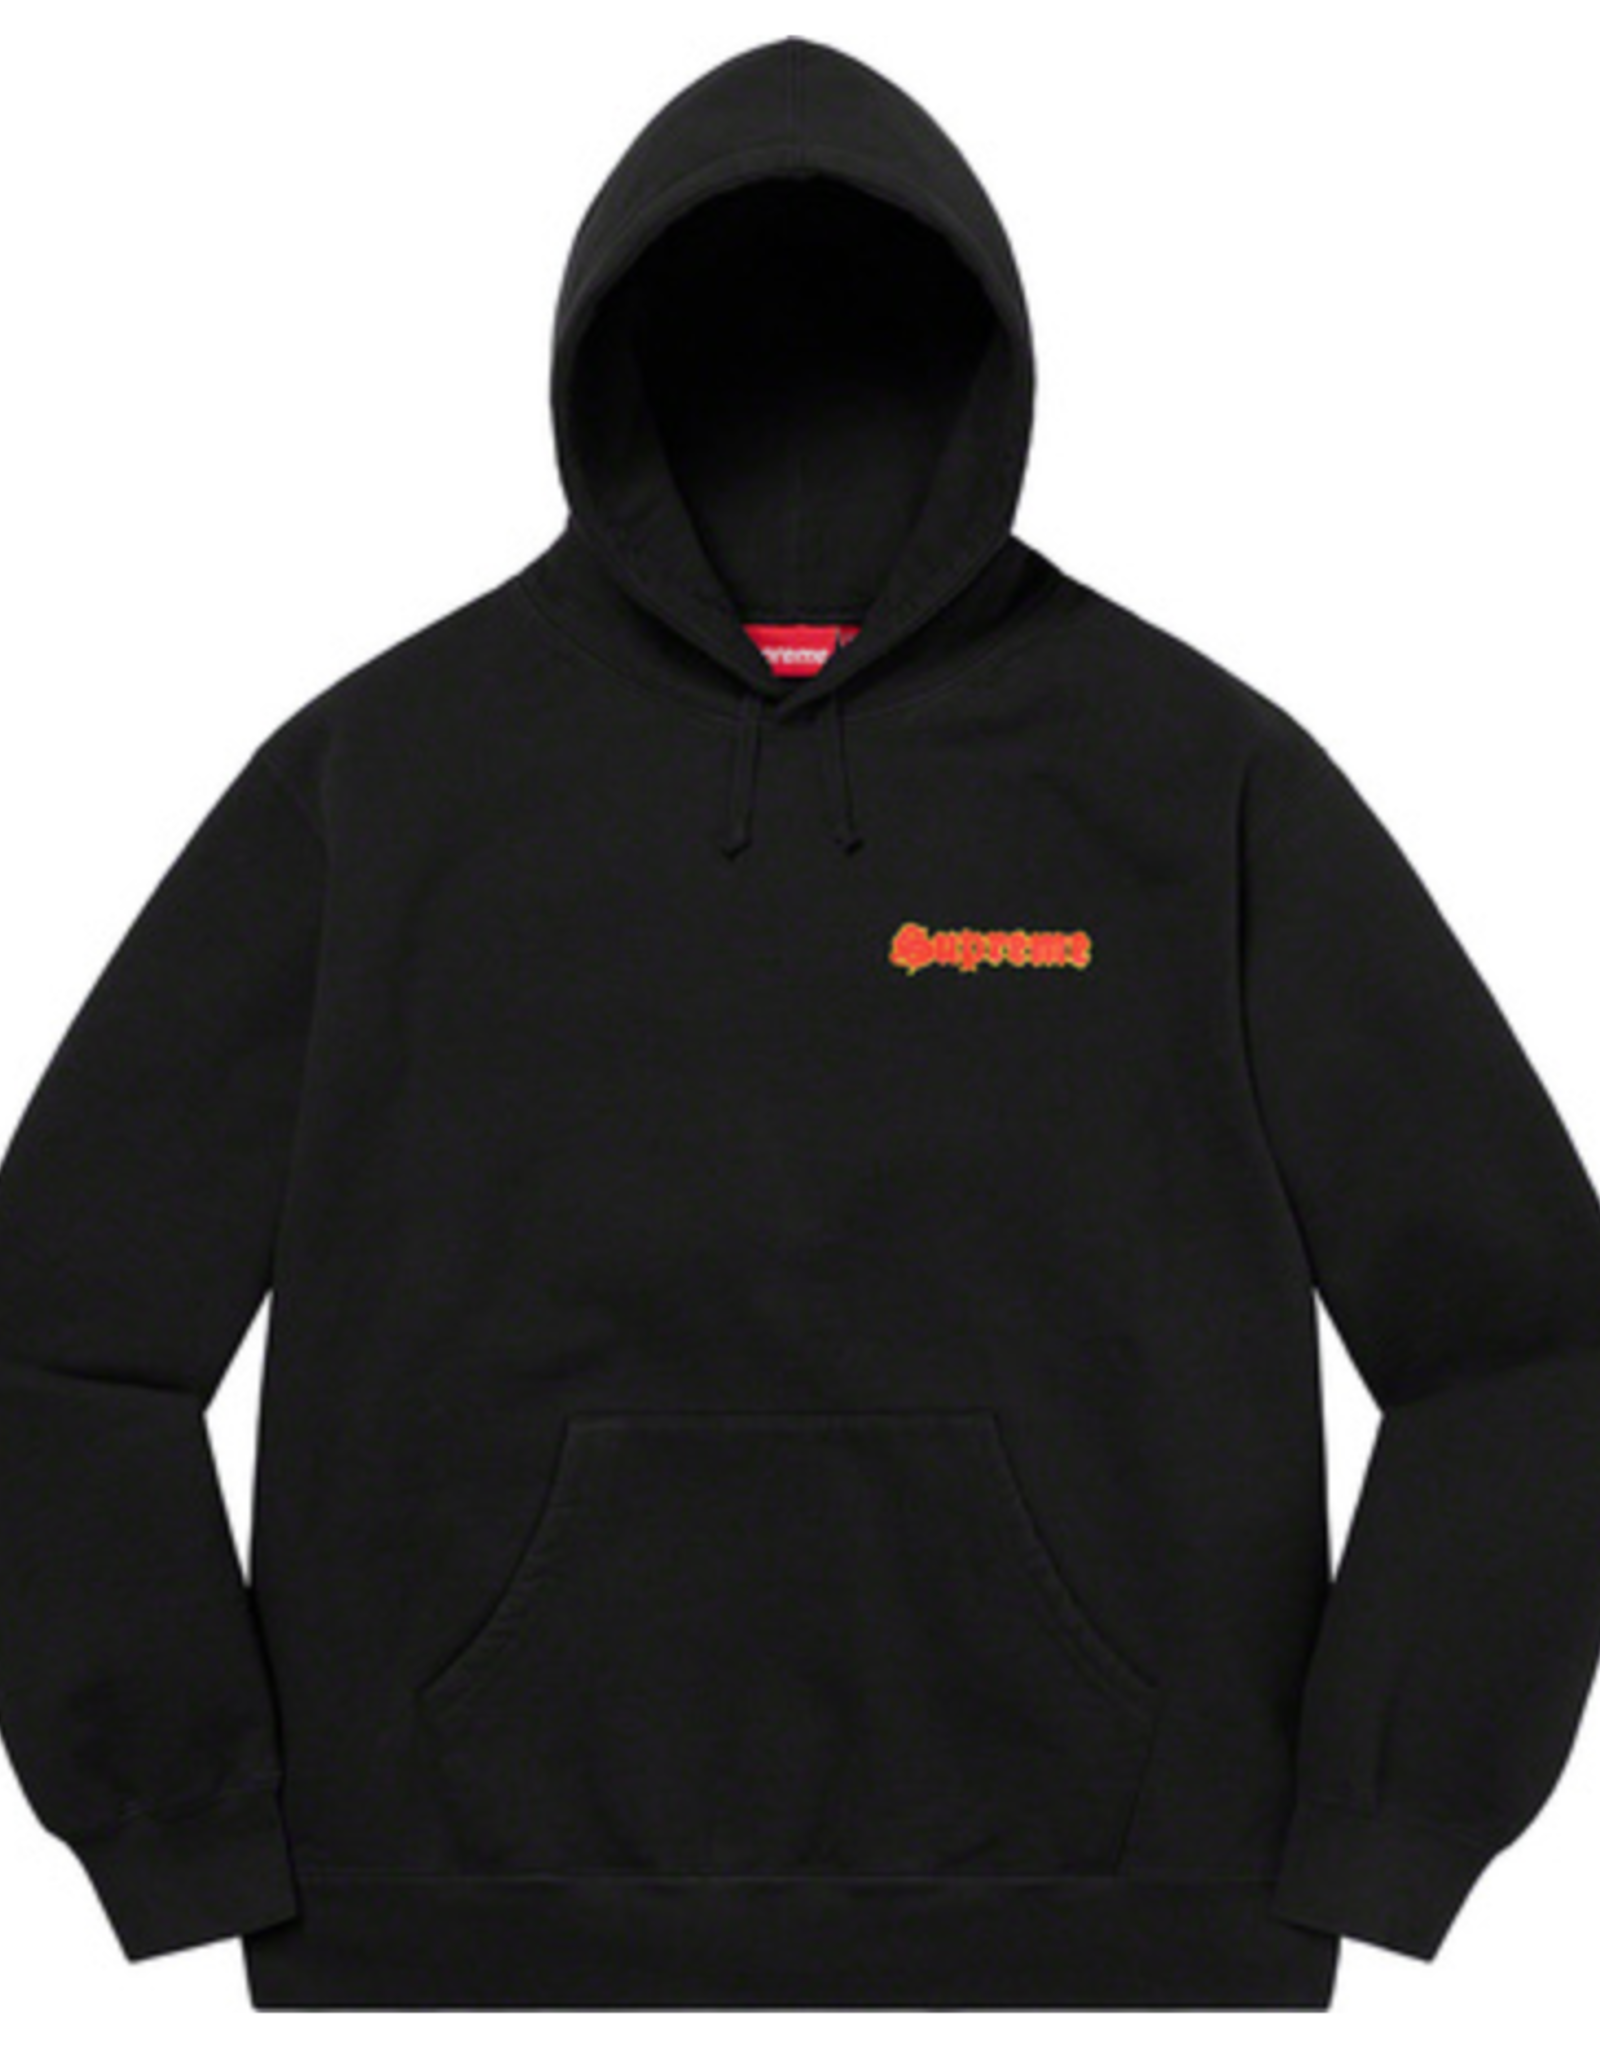 SUPREME Black Supreme Love Hooded Sweatshirt - XL